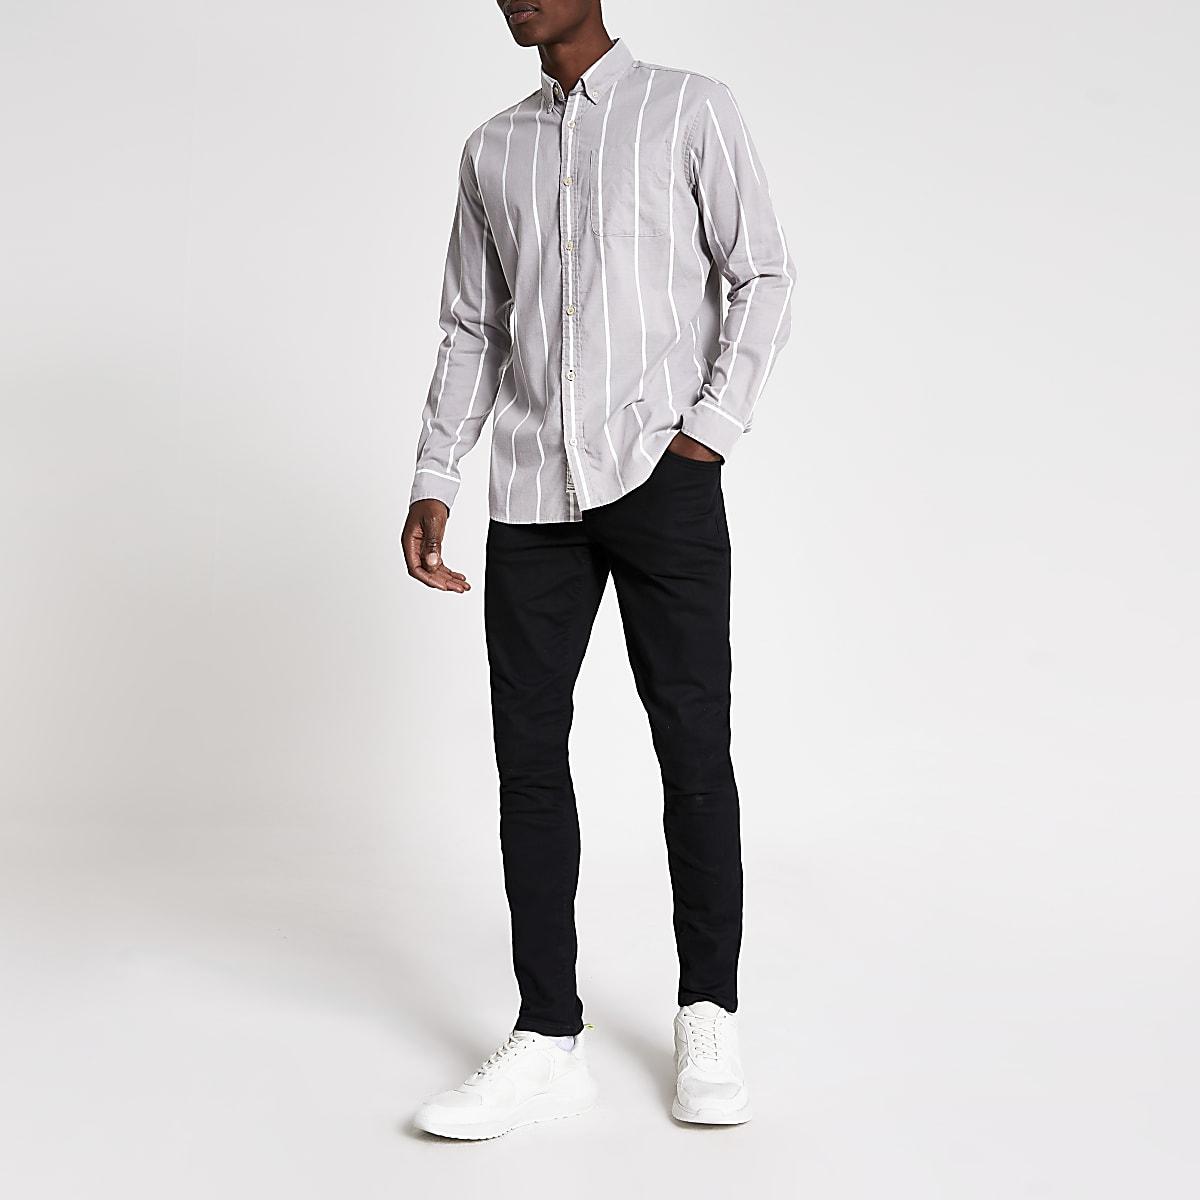 Jack and Jones grey stripe regular fit shirt